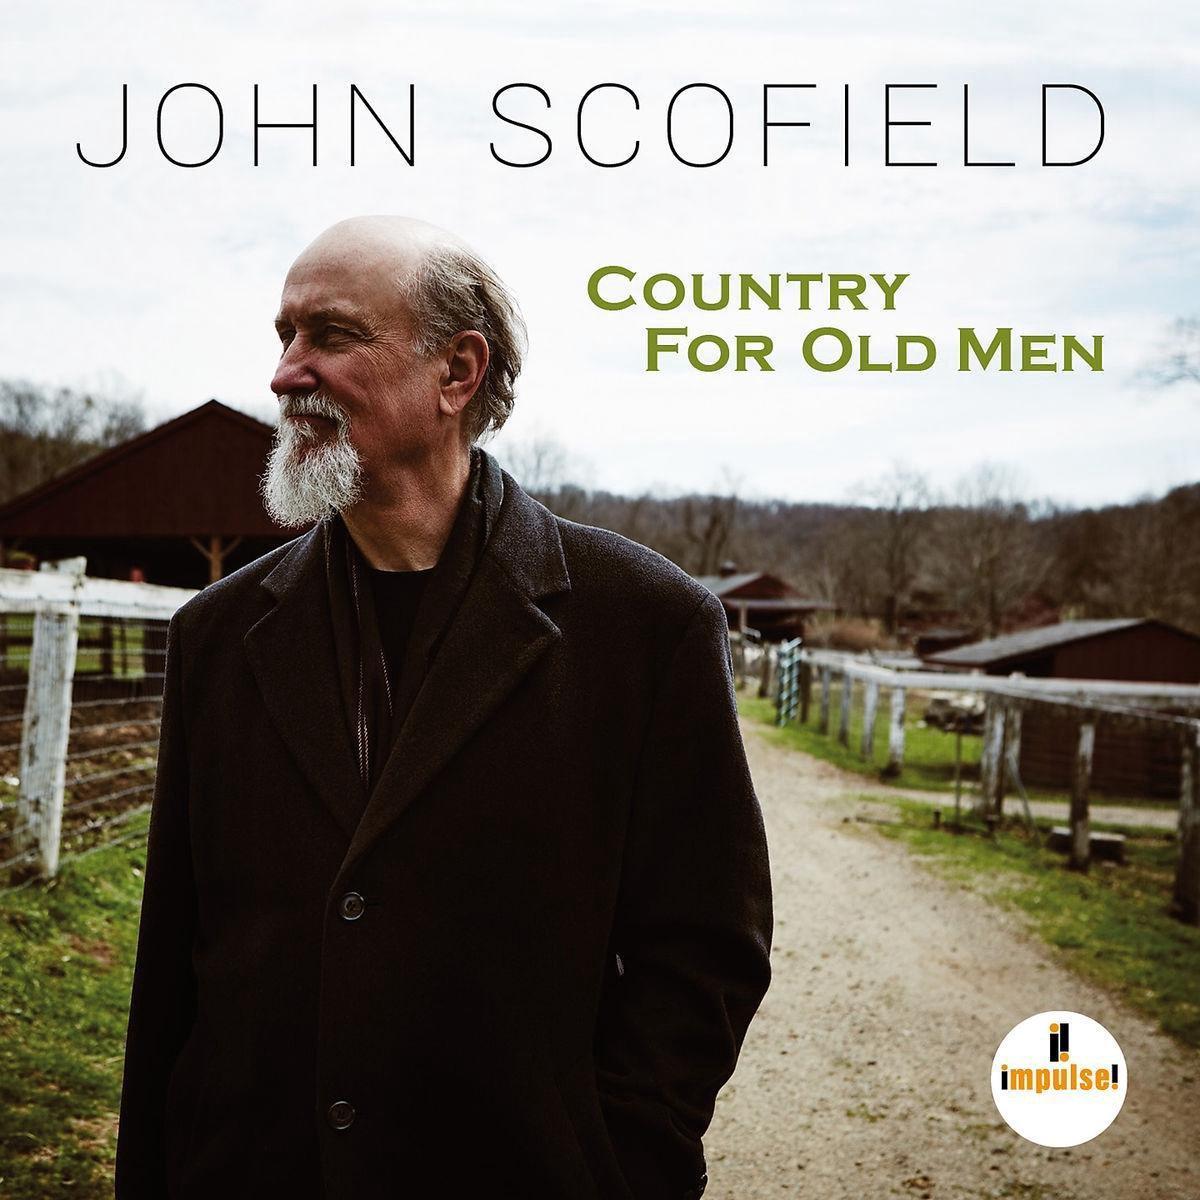 Scofield John - Country For Old Men - John Scofield